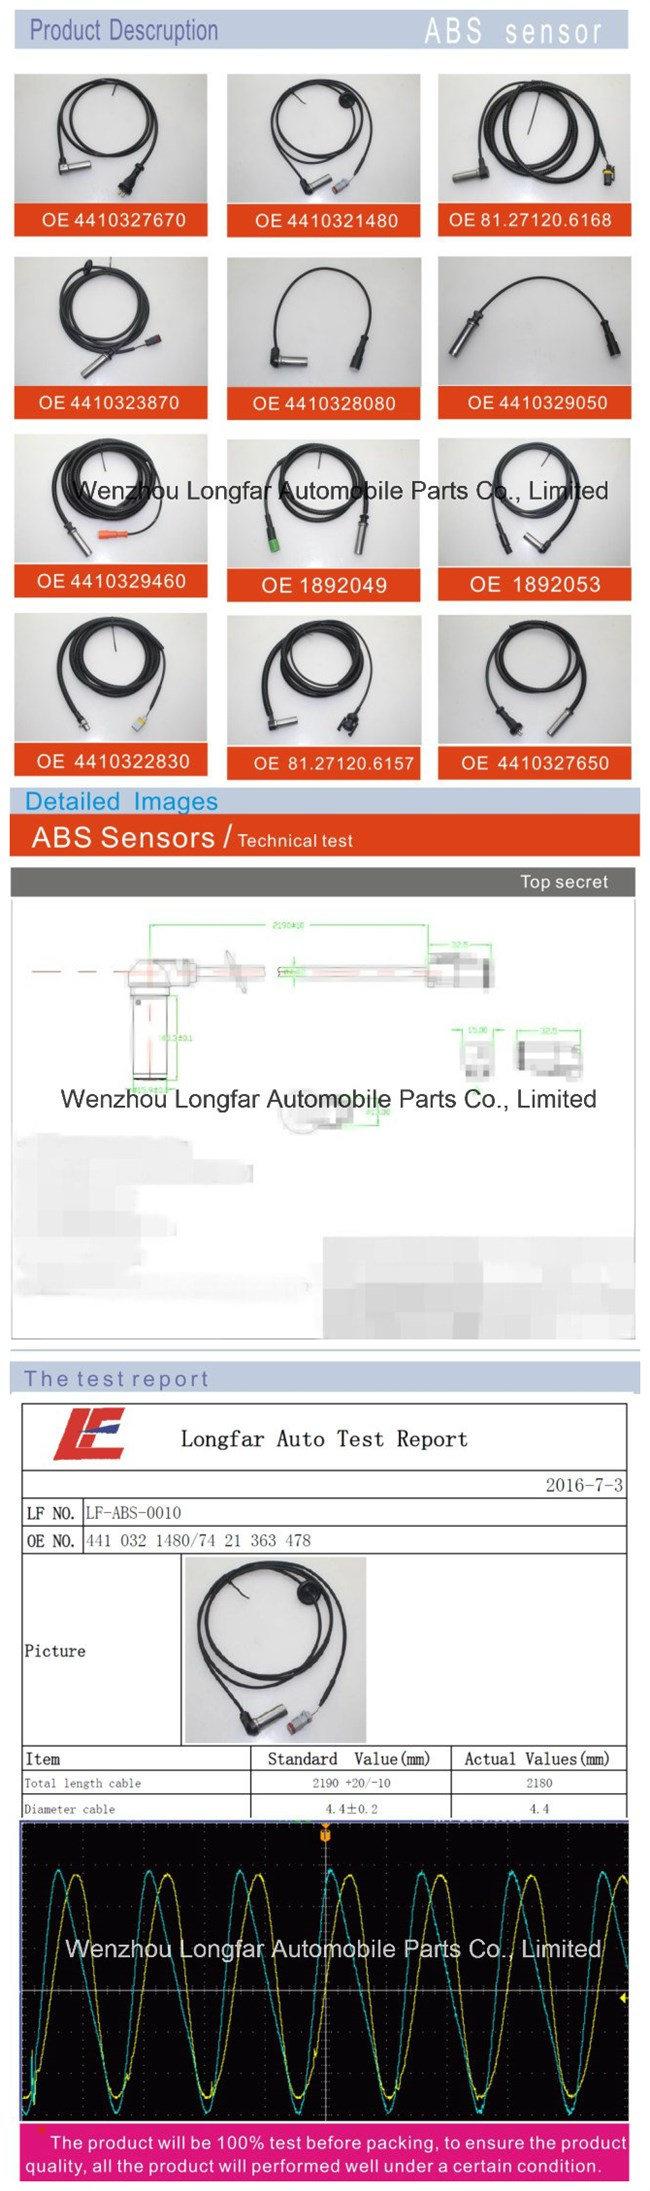 Auto Map Snesor Vehicle Manifold Absolute Pressure Transducer Indicator Sensor 3930038100,Su4981,5s2469,As197,550766 for Hyundai,KIA,Airtex,Standard,Autozone